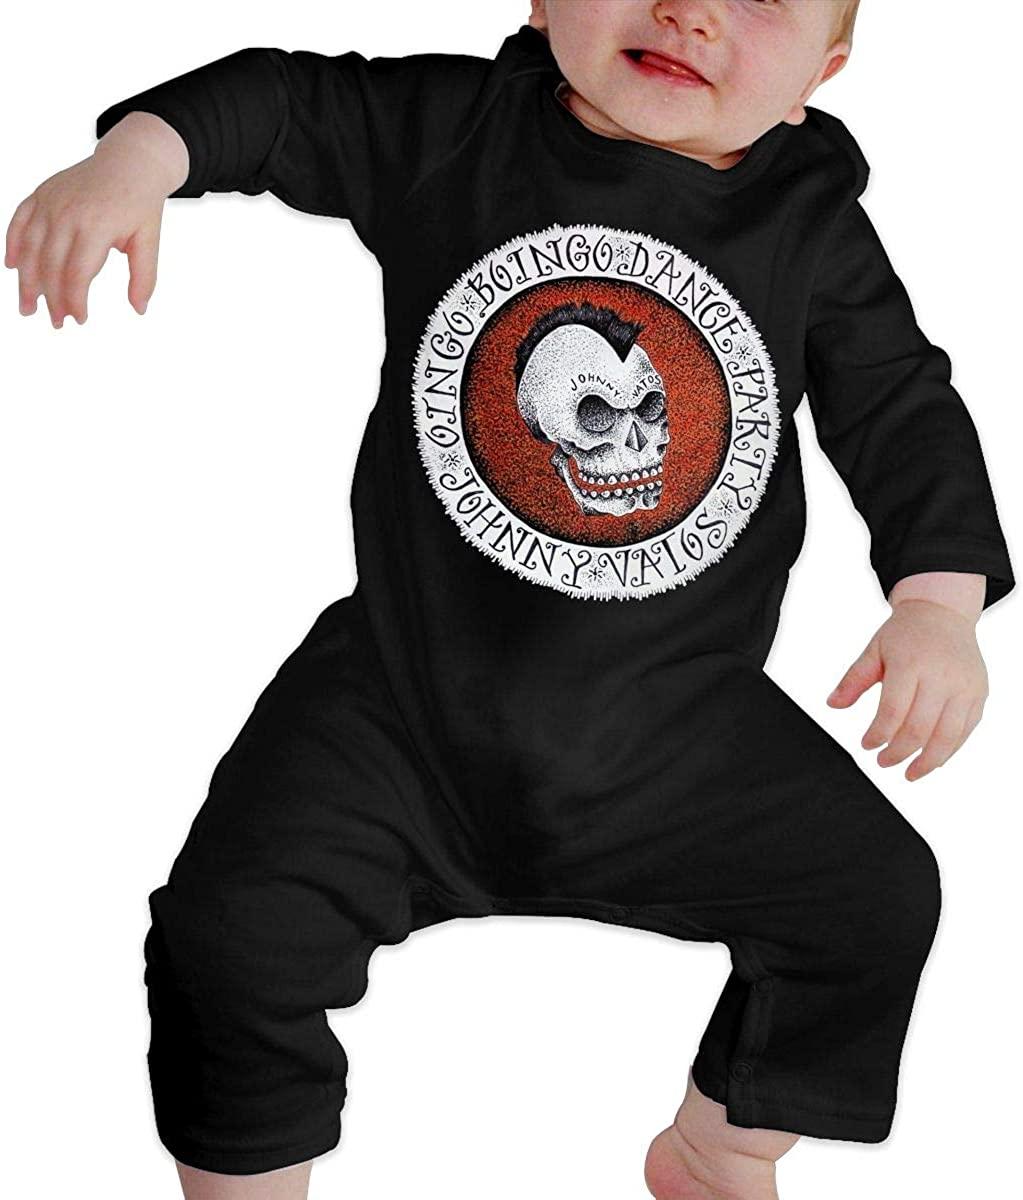 Qq1-asd-store Oingo Boingo Boys/Girls Baby Cotton Long Sleeve Romper Warm Bodysuit